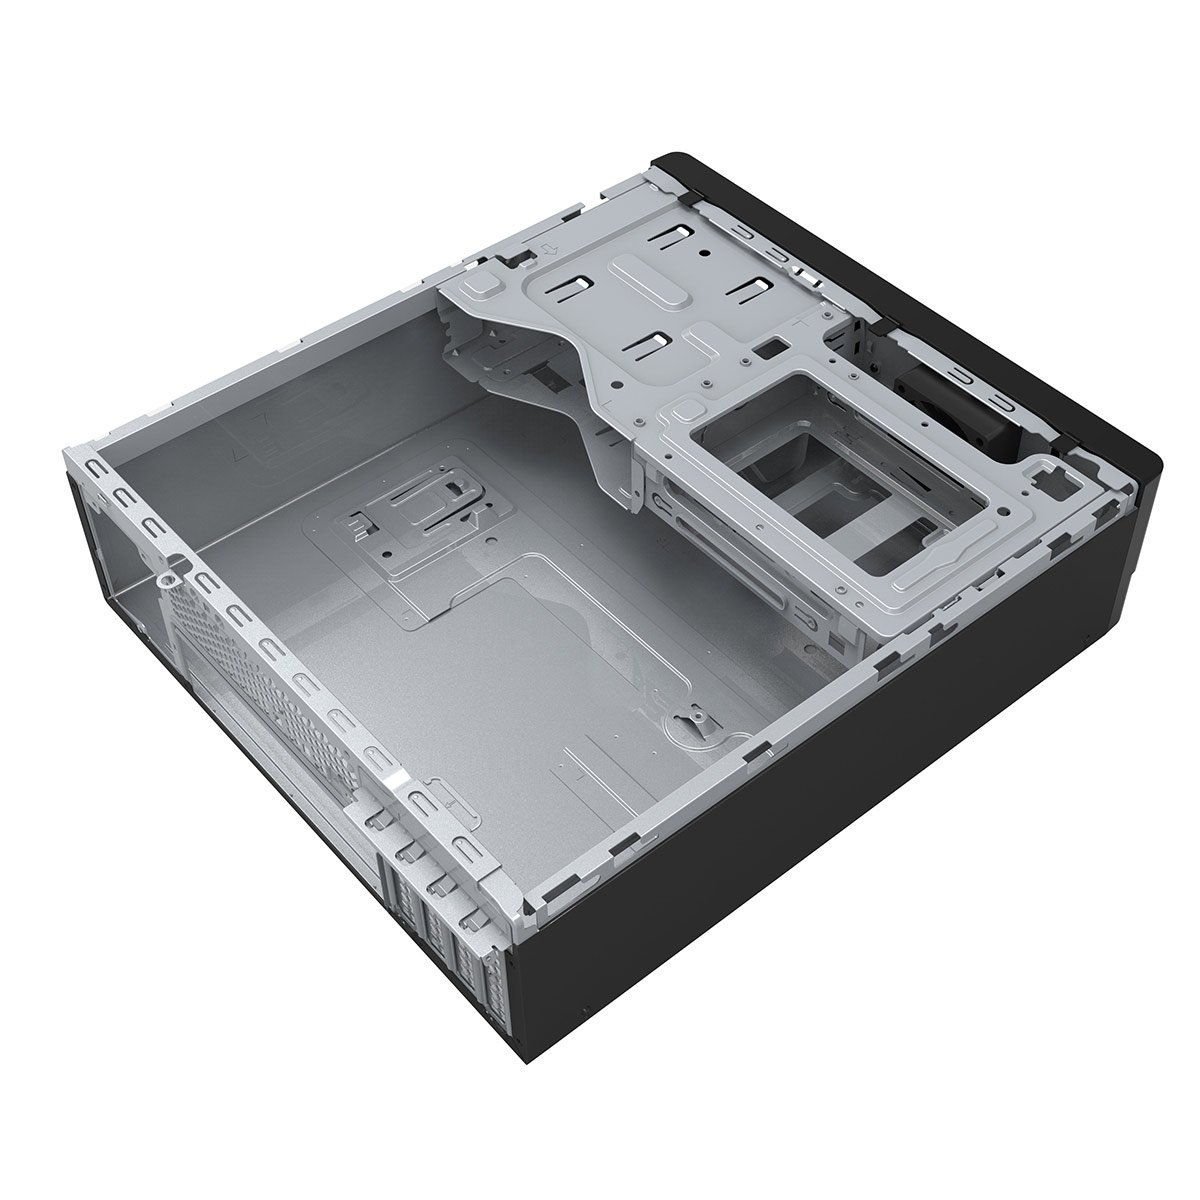 Amazon.com: CiT S503 Micro ATX – Carcasa para PC de ...